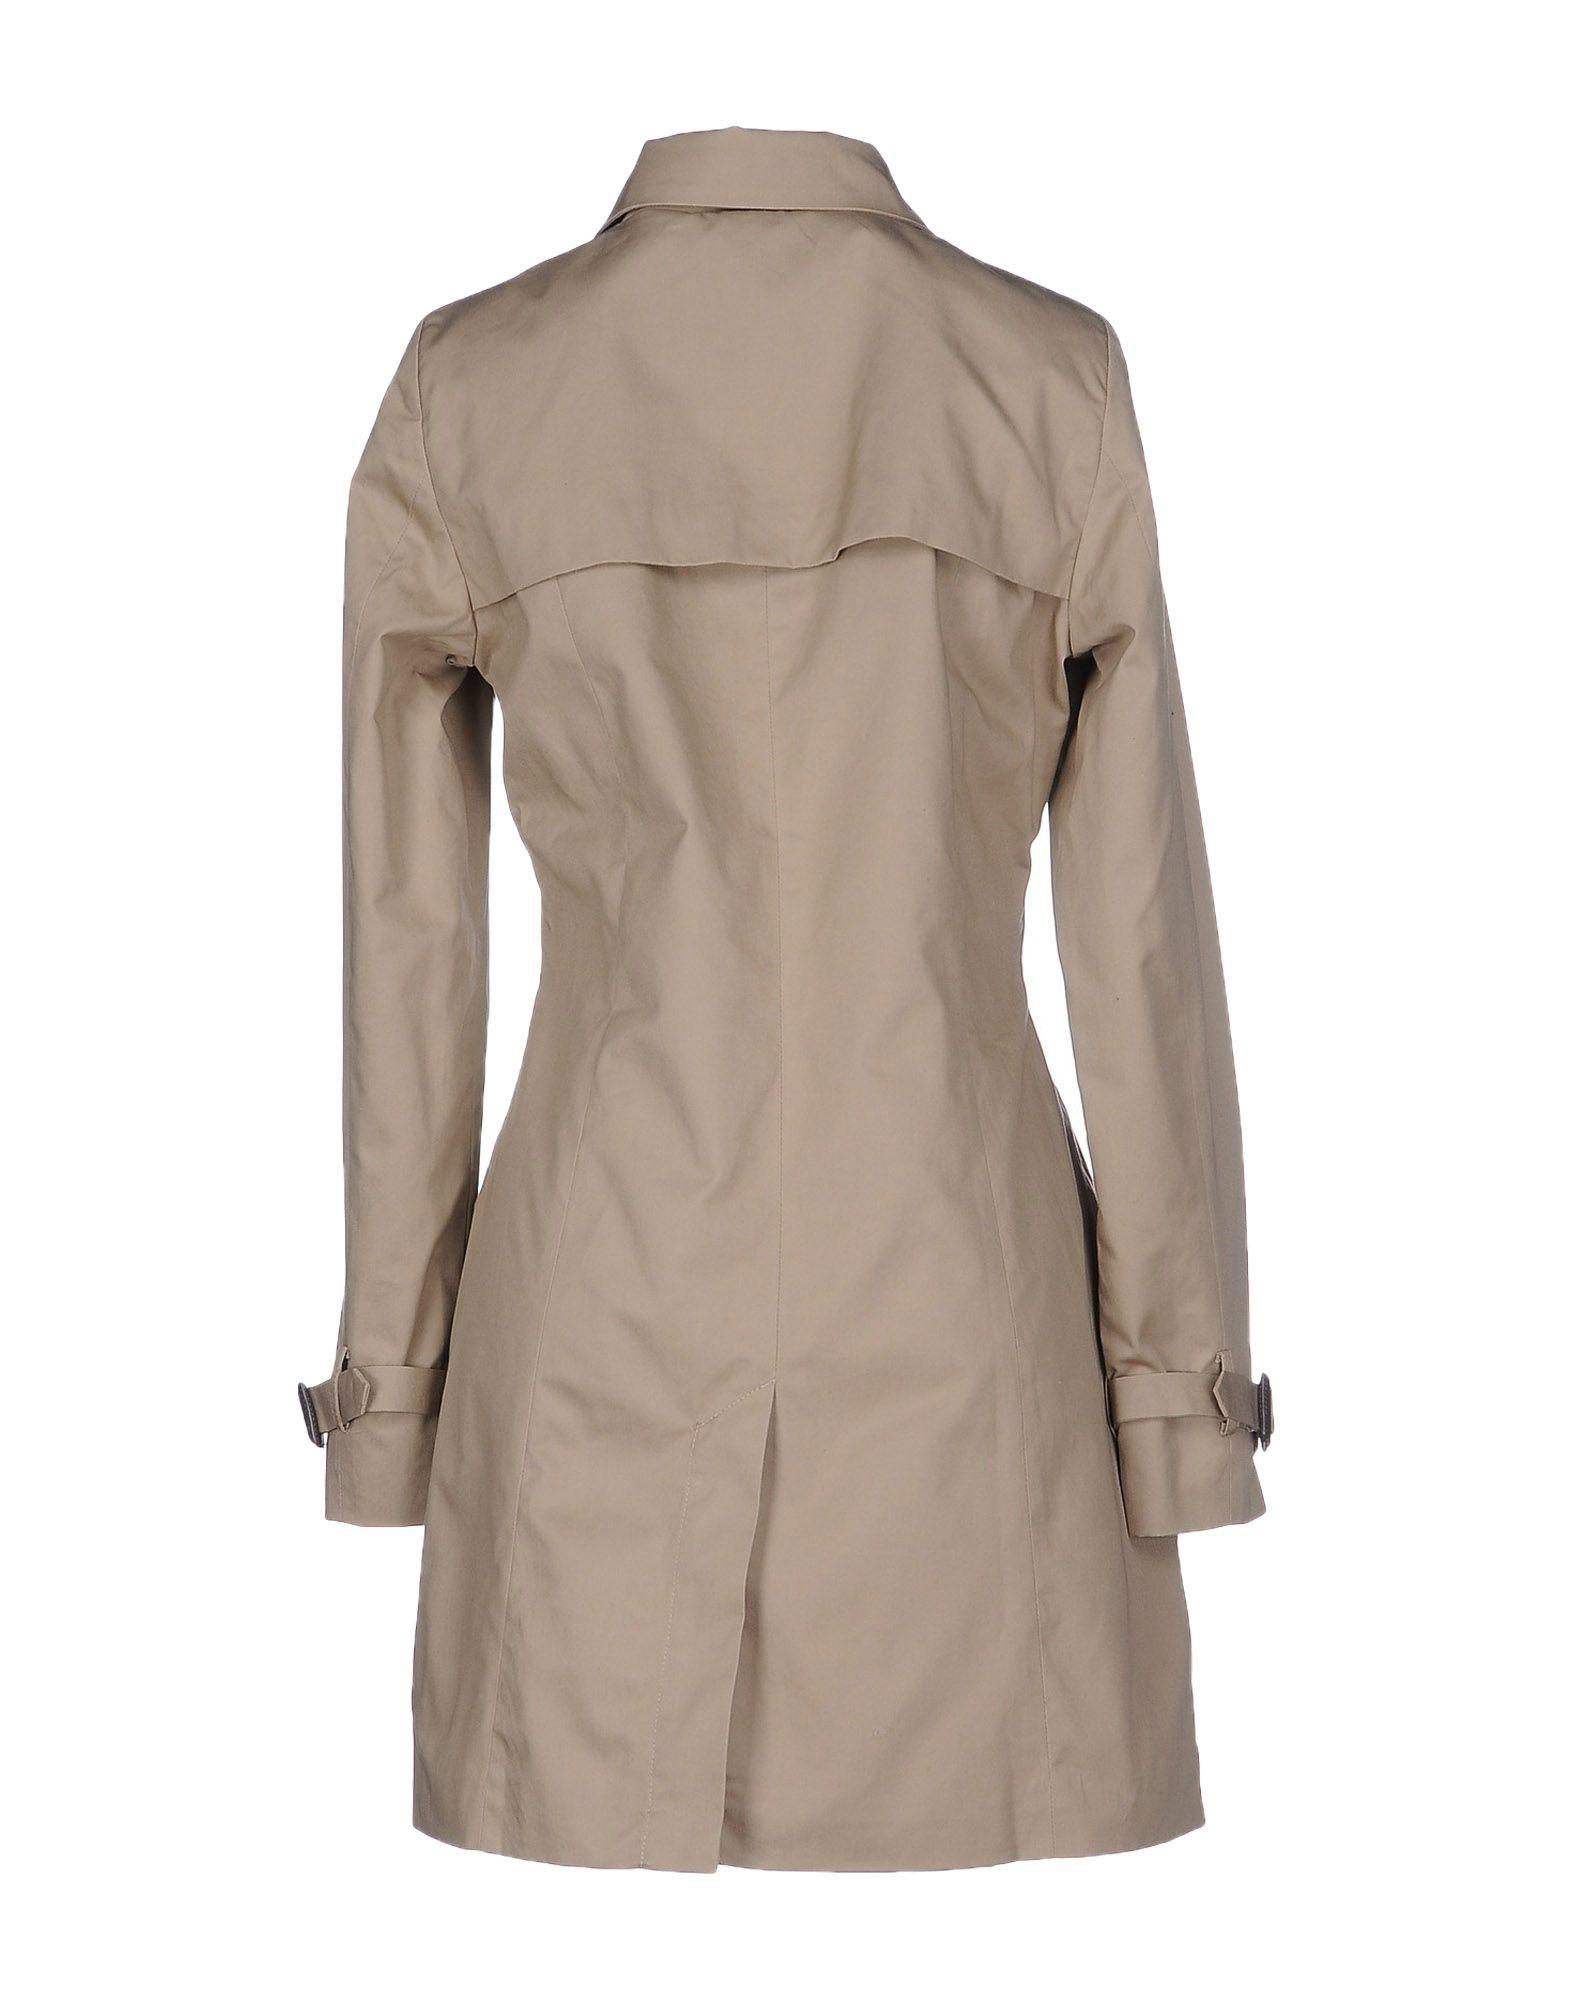 vero moda full length jacket in natural lyst. Black Bedroom Furniture Sets. Home Design Ideas